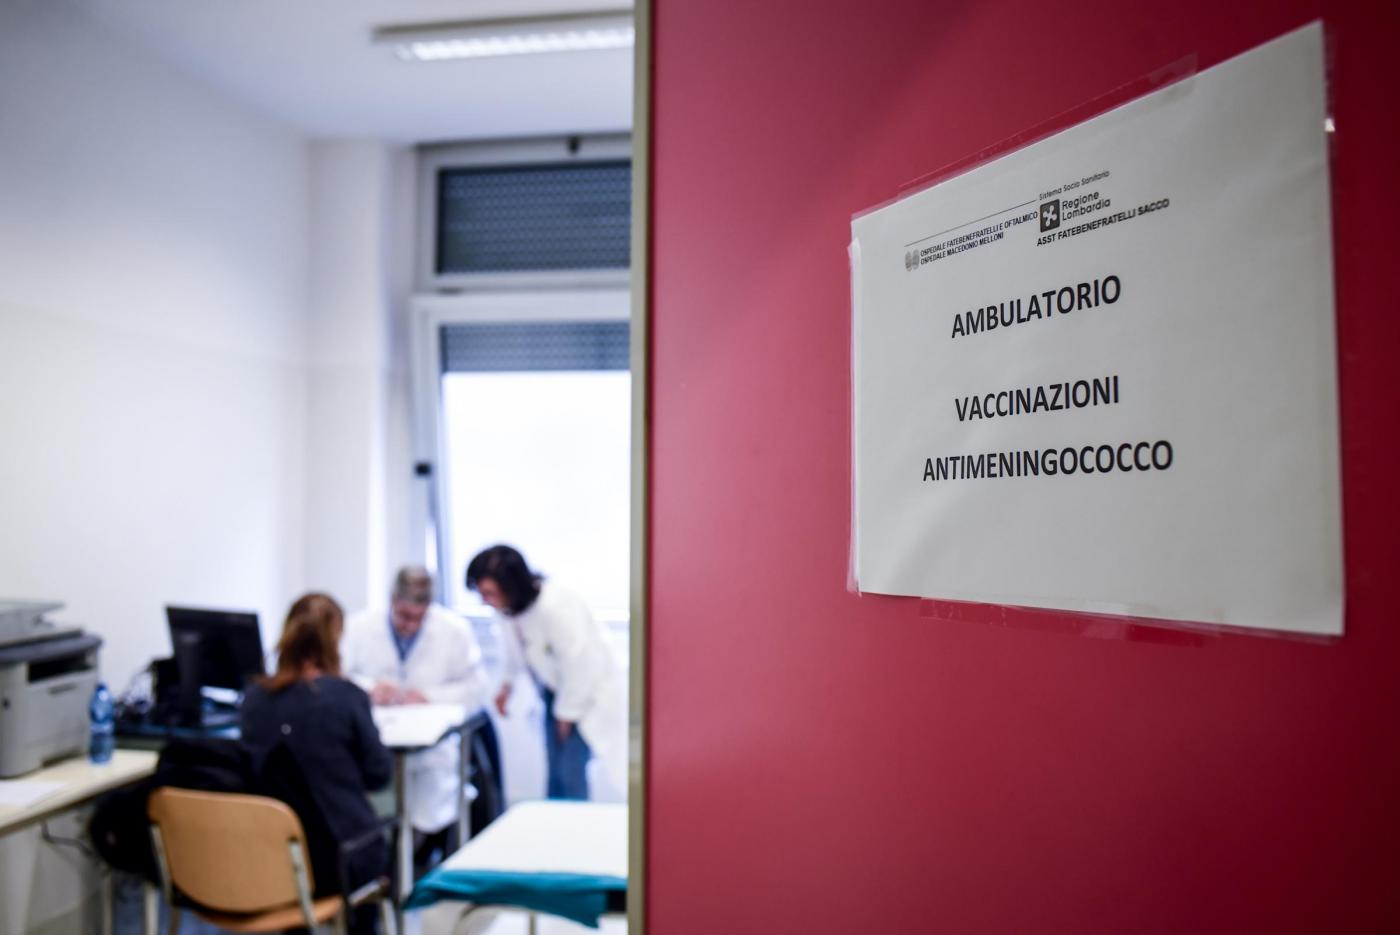 meningite Milano - Lombardia, Vaccino anti meningite Ospedale Fatebenefratelli